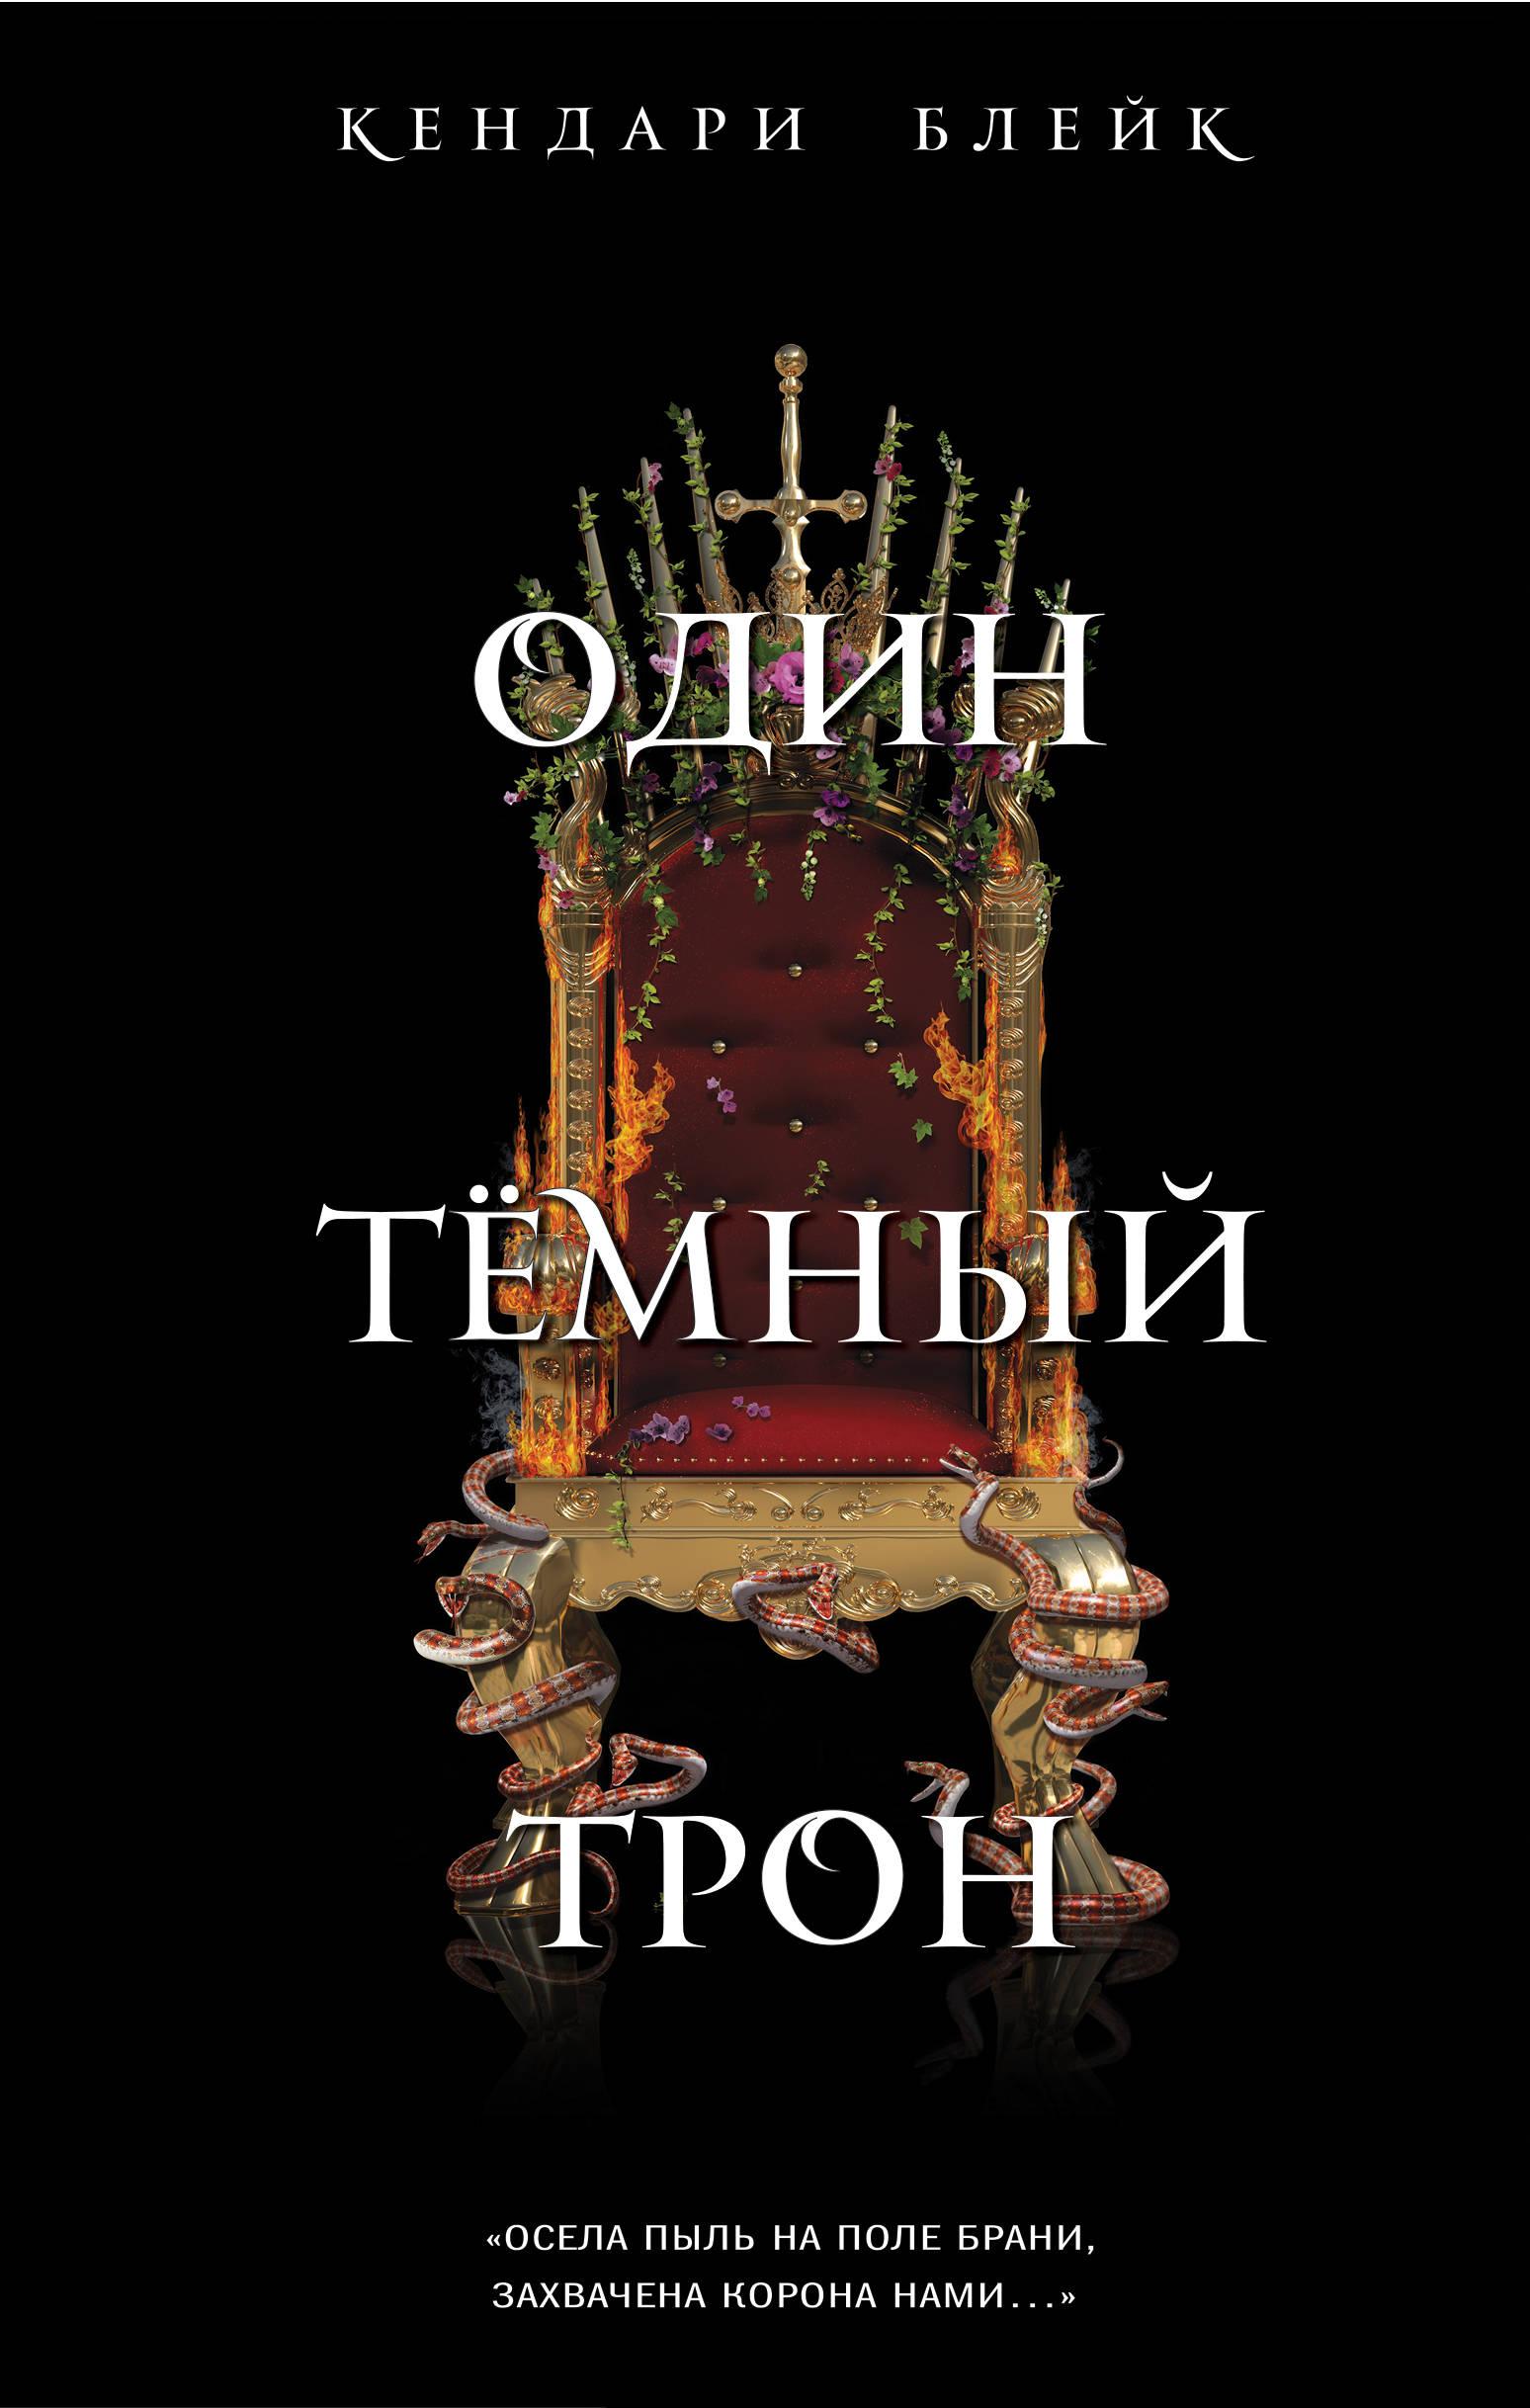 Блейк Кендари Один темный трон